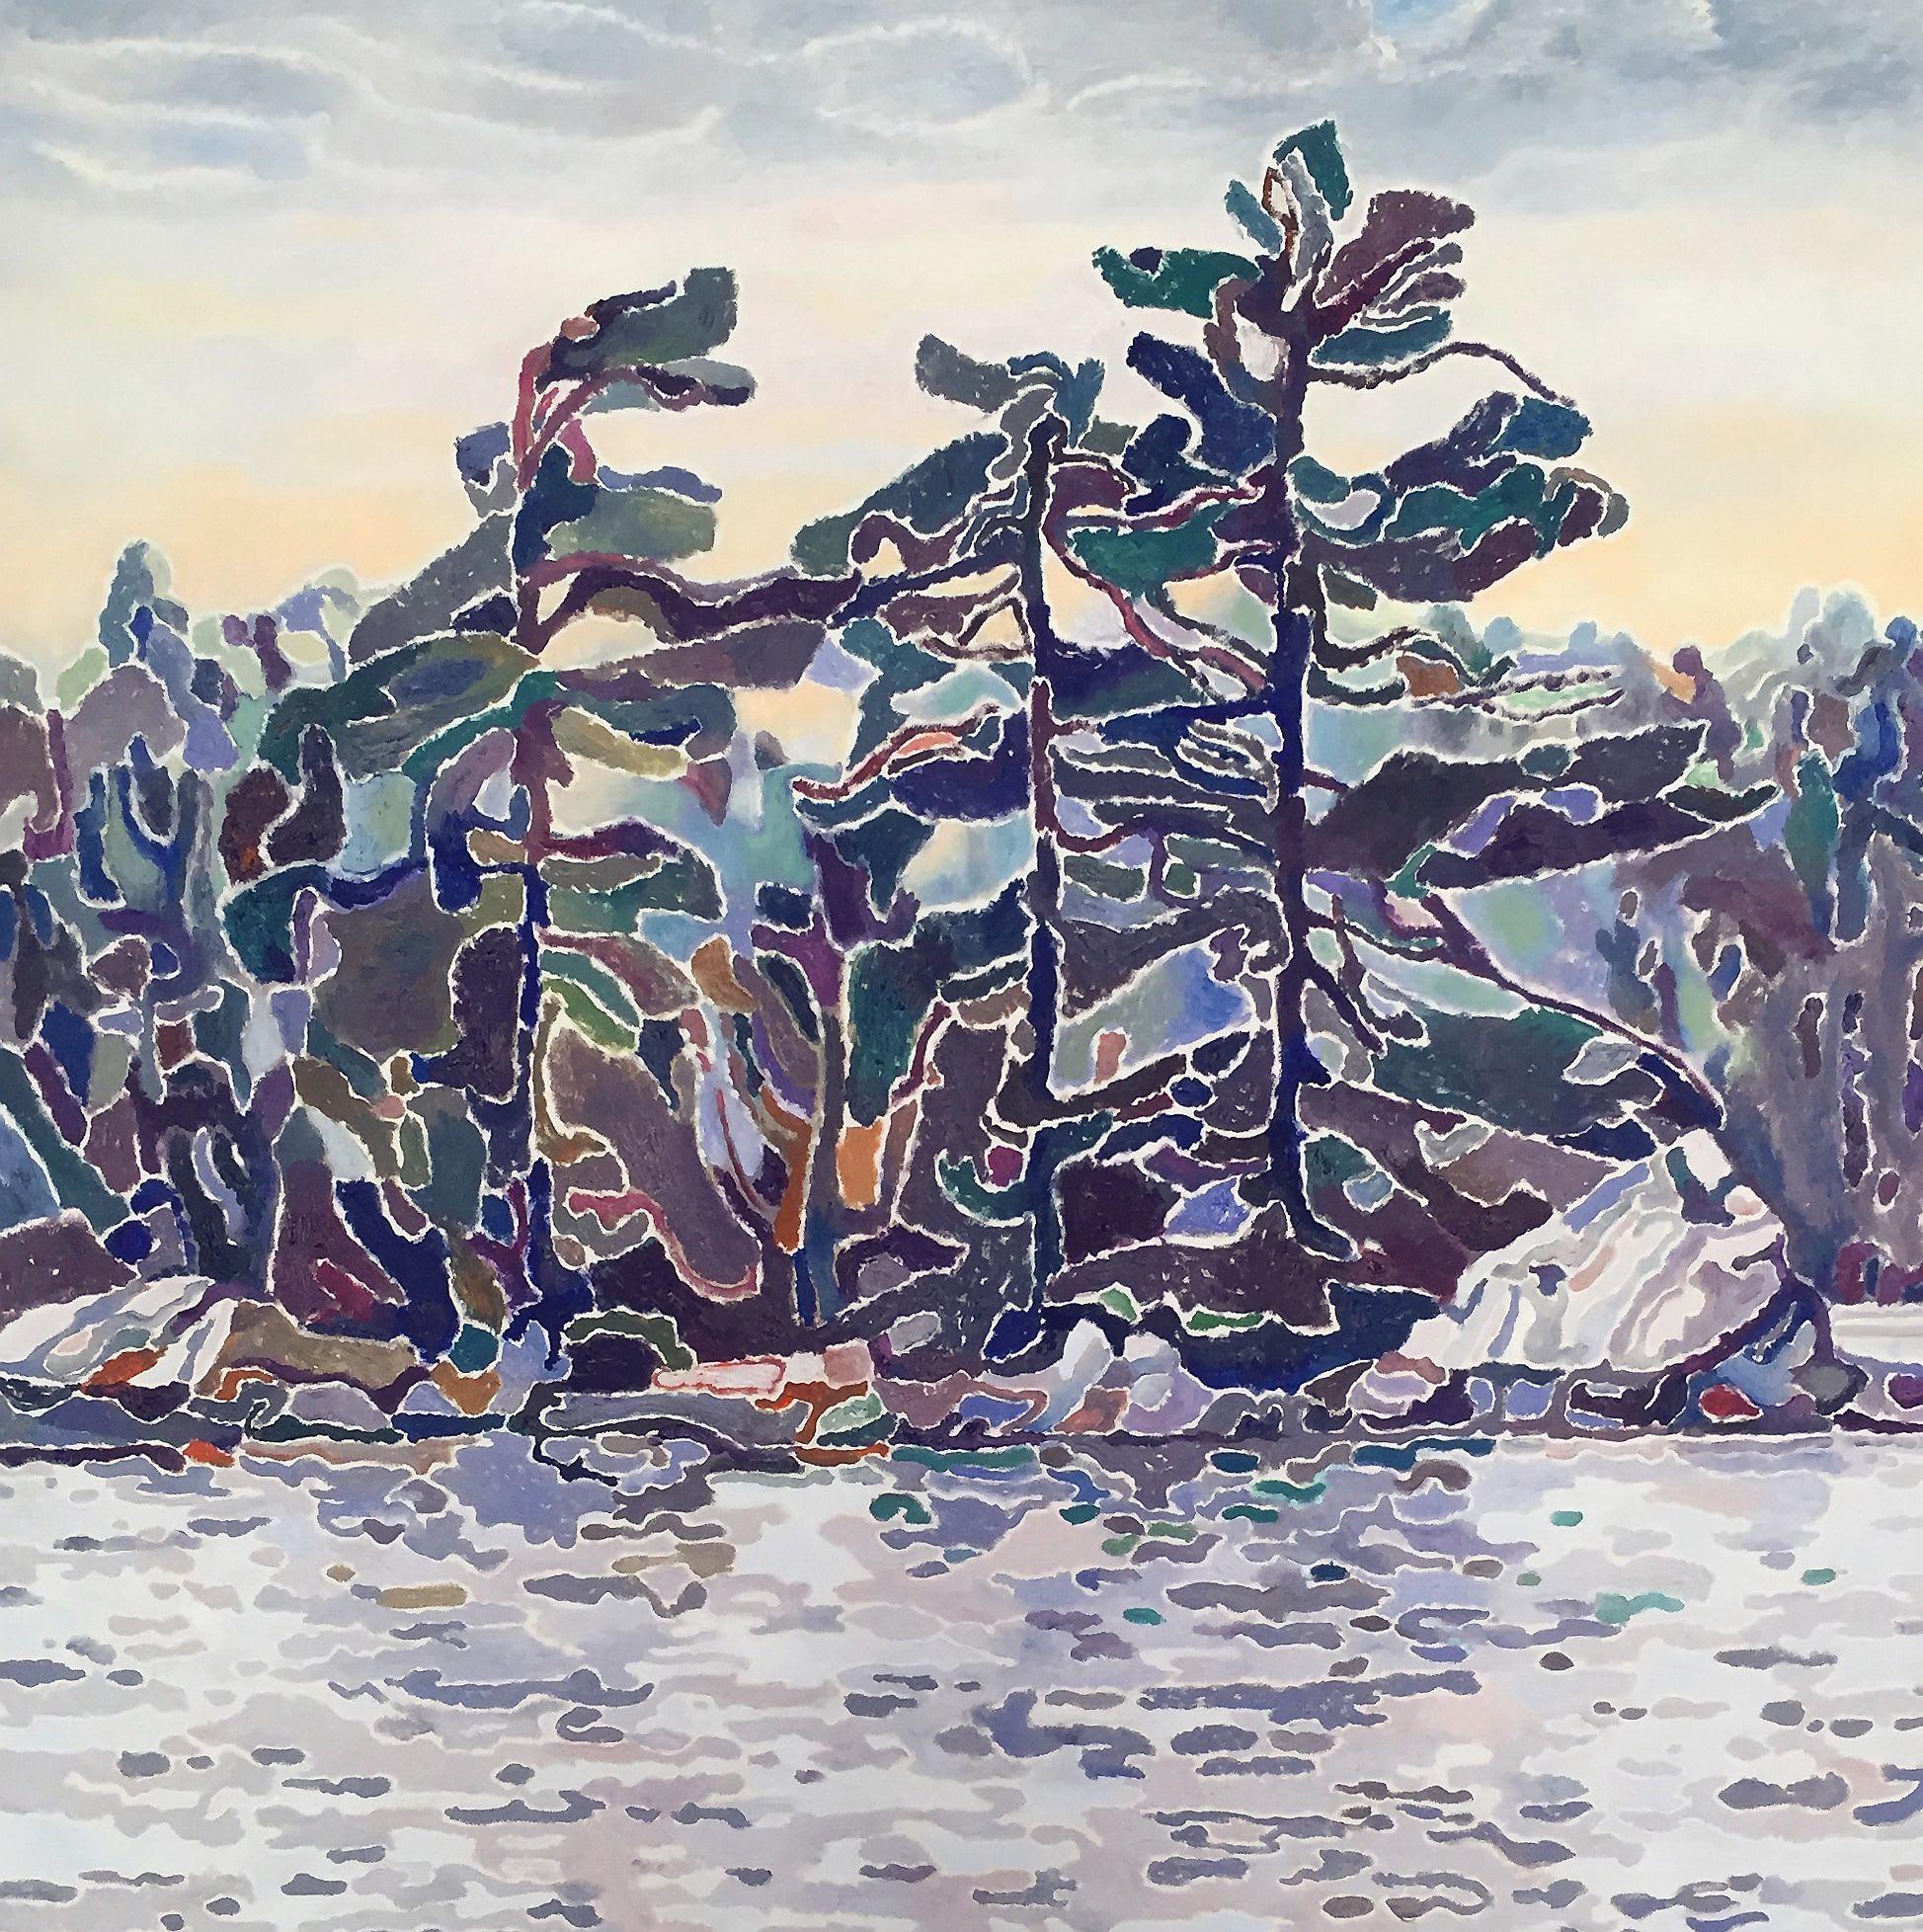 'Kilarney 2' by Orlin Mantchev at Gallery 133